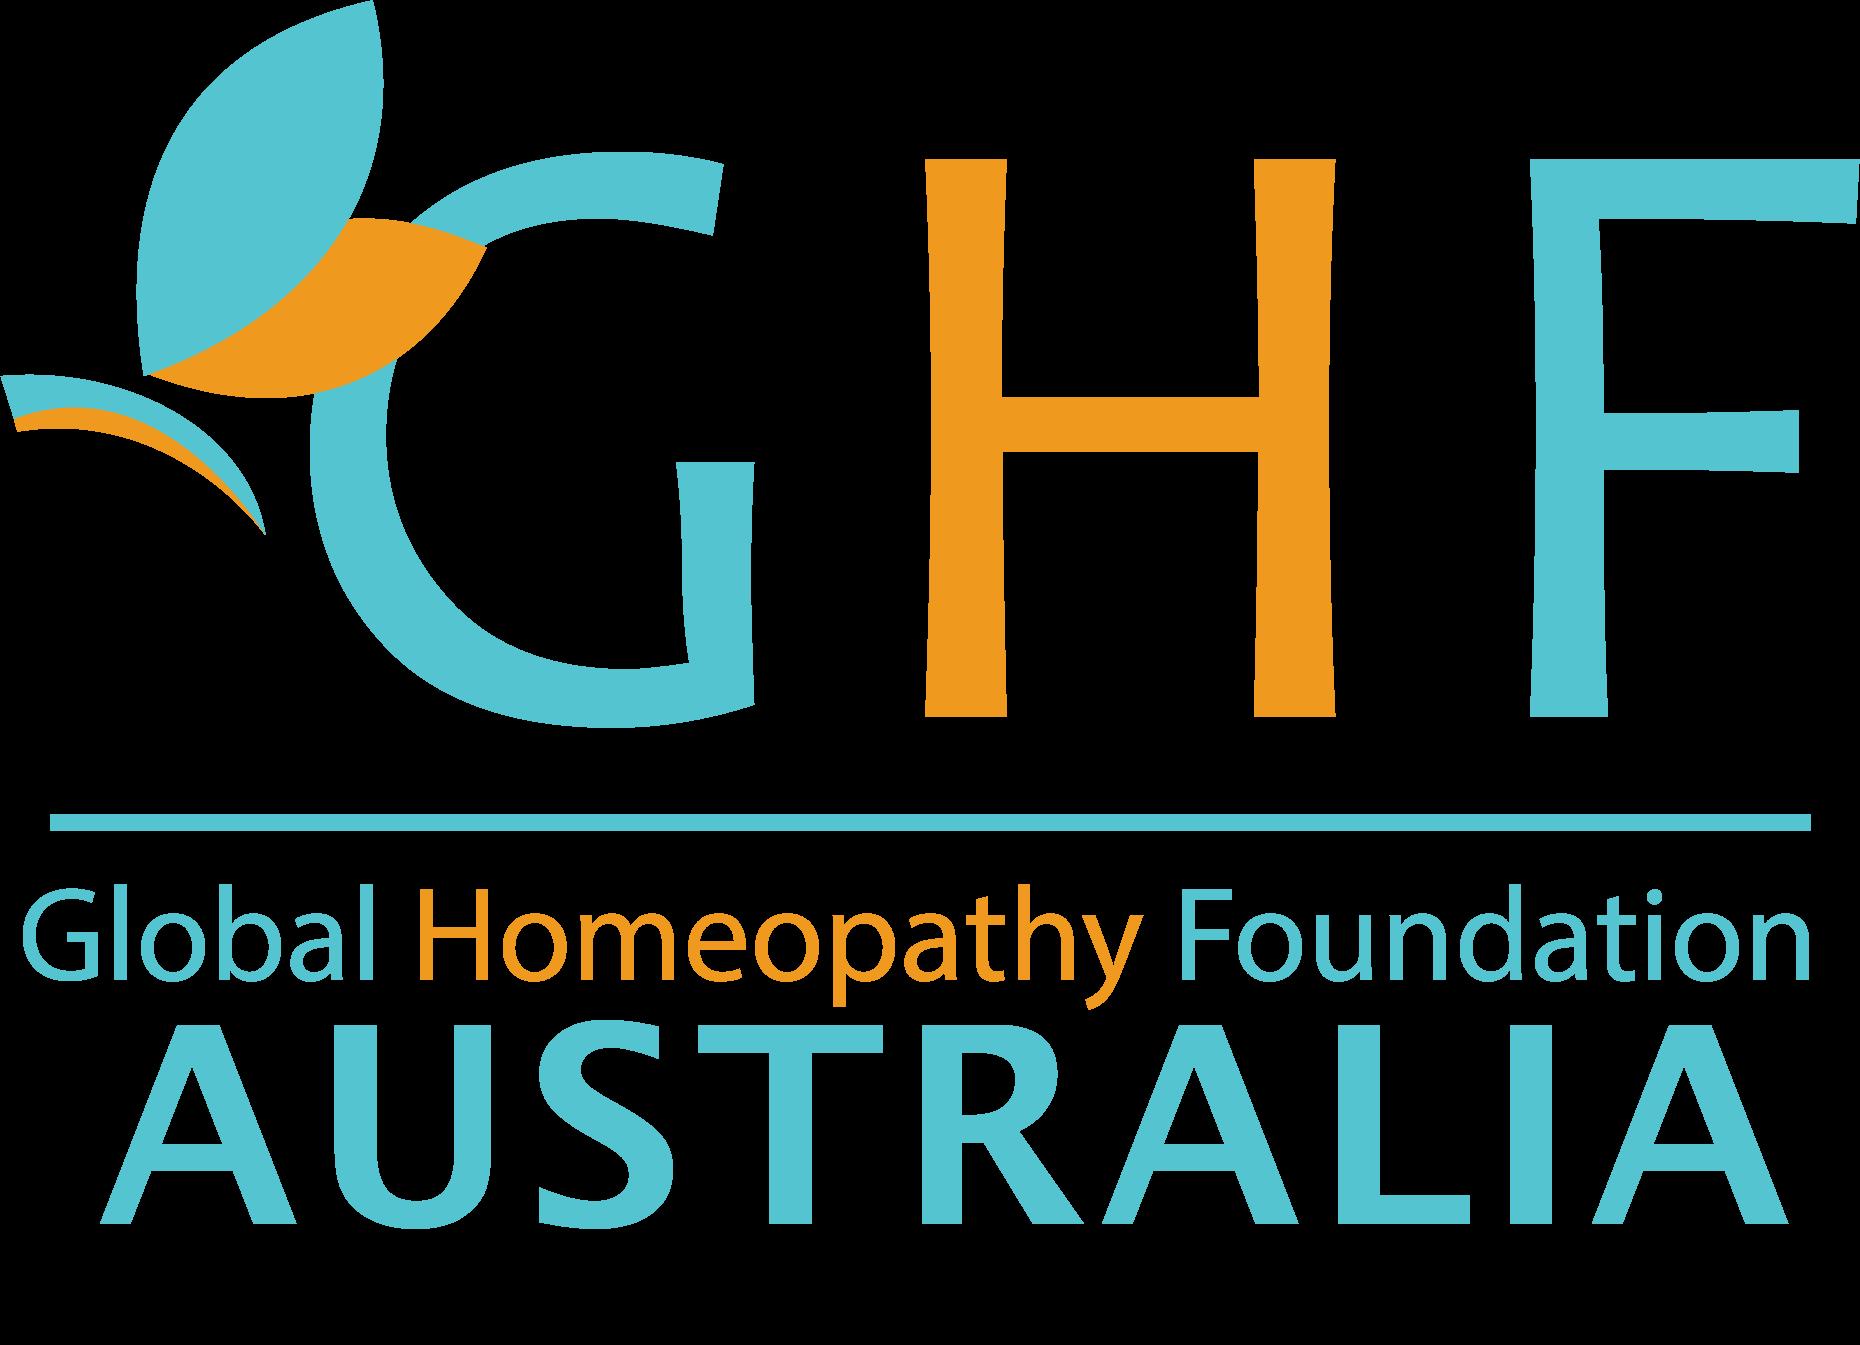 GHF Australia